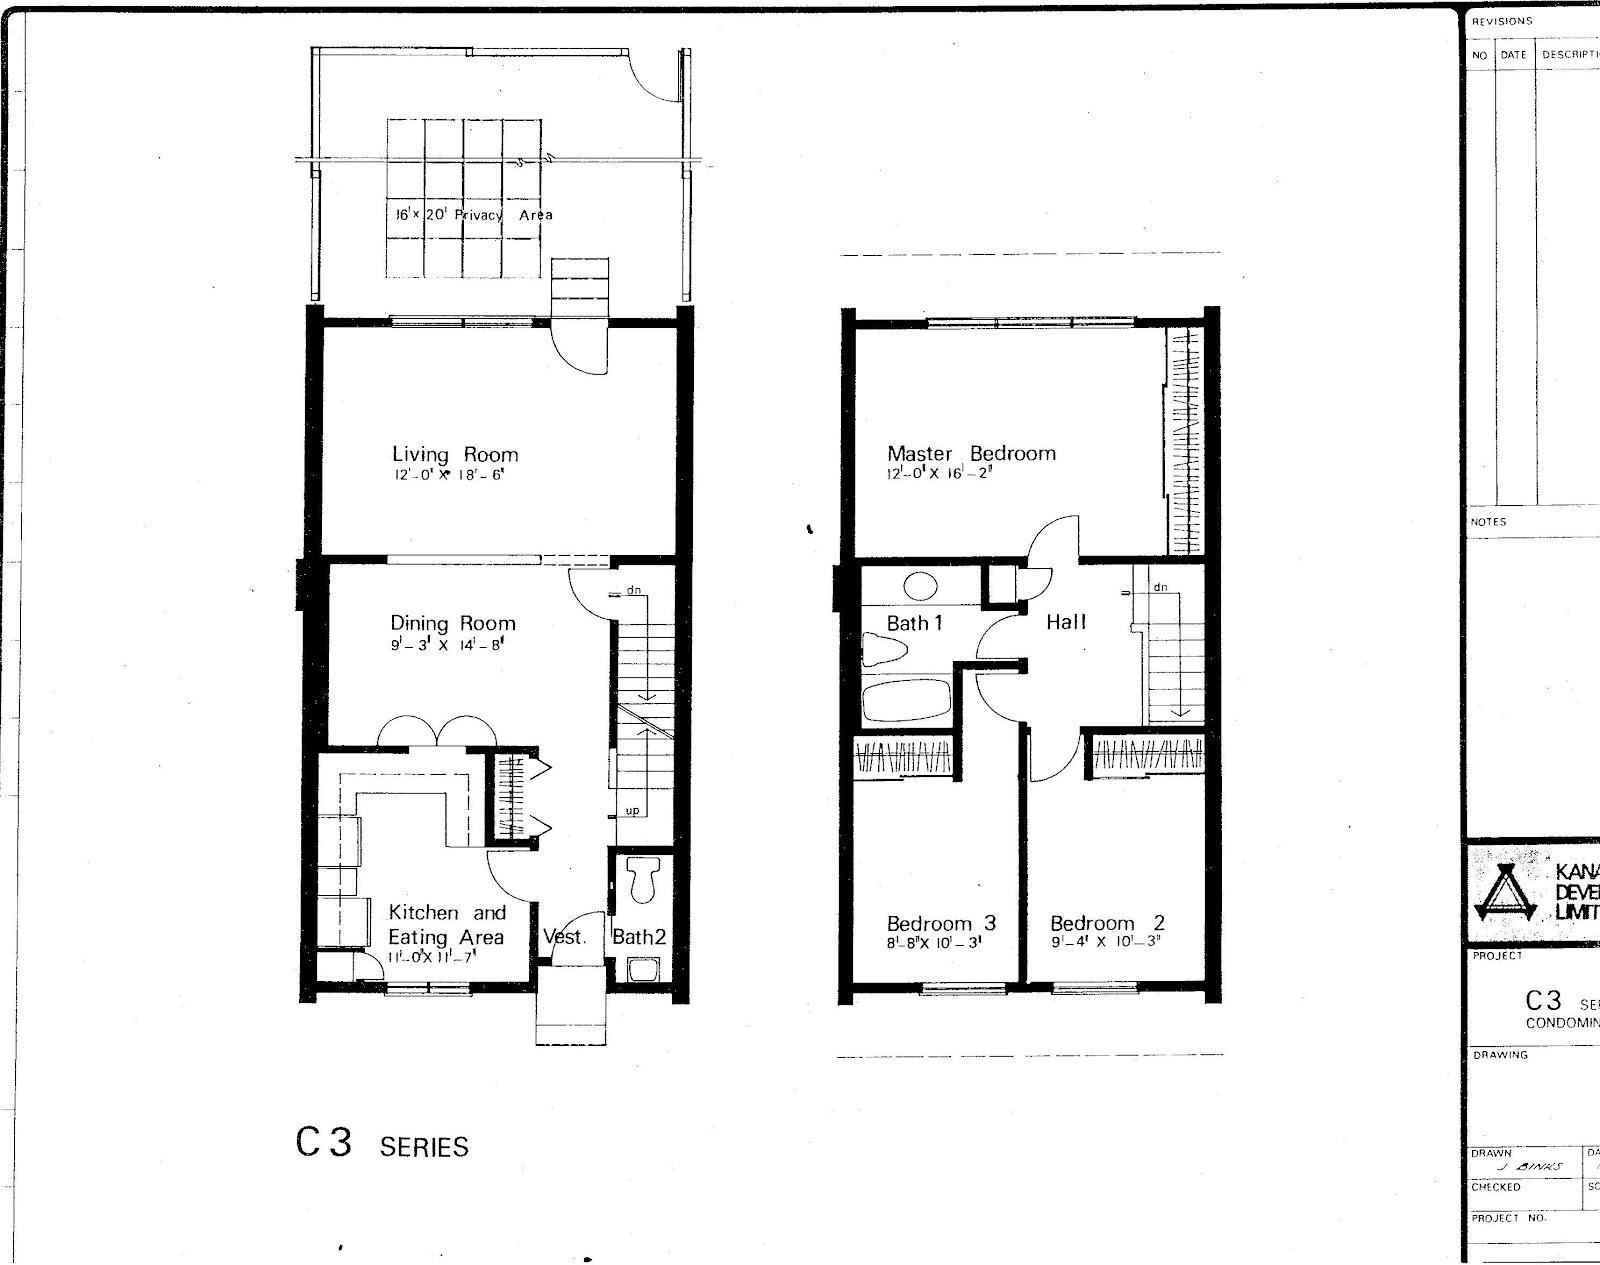 Urbandale kanata model homes